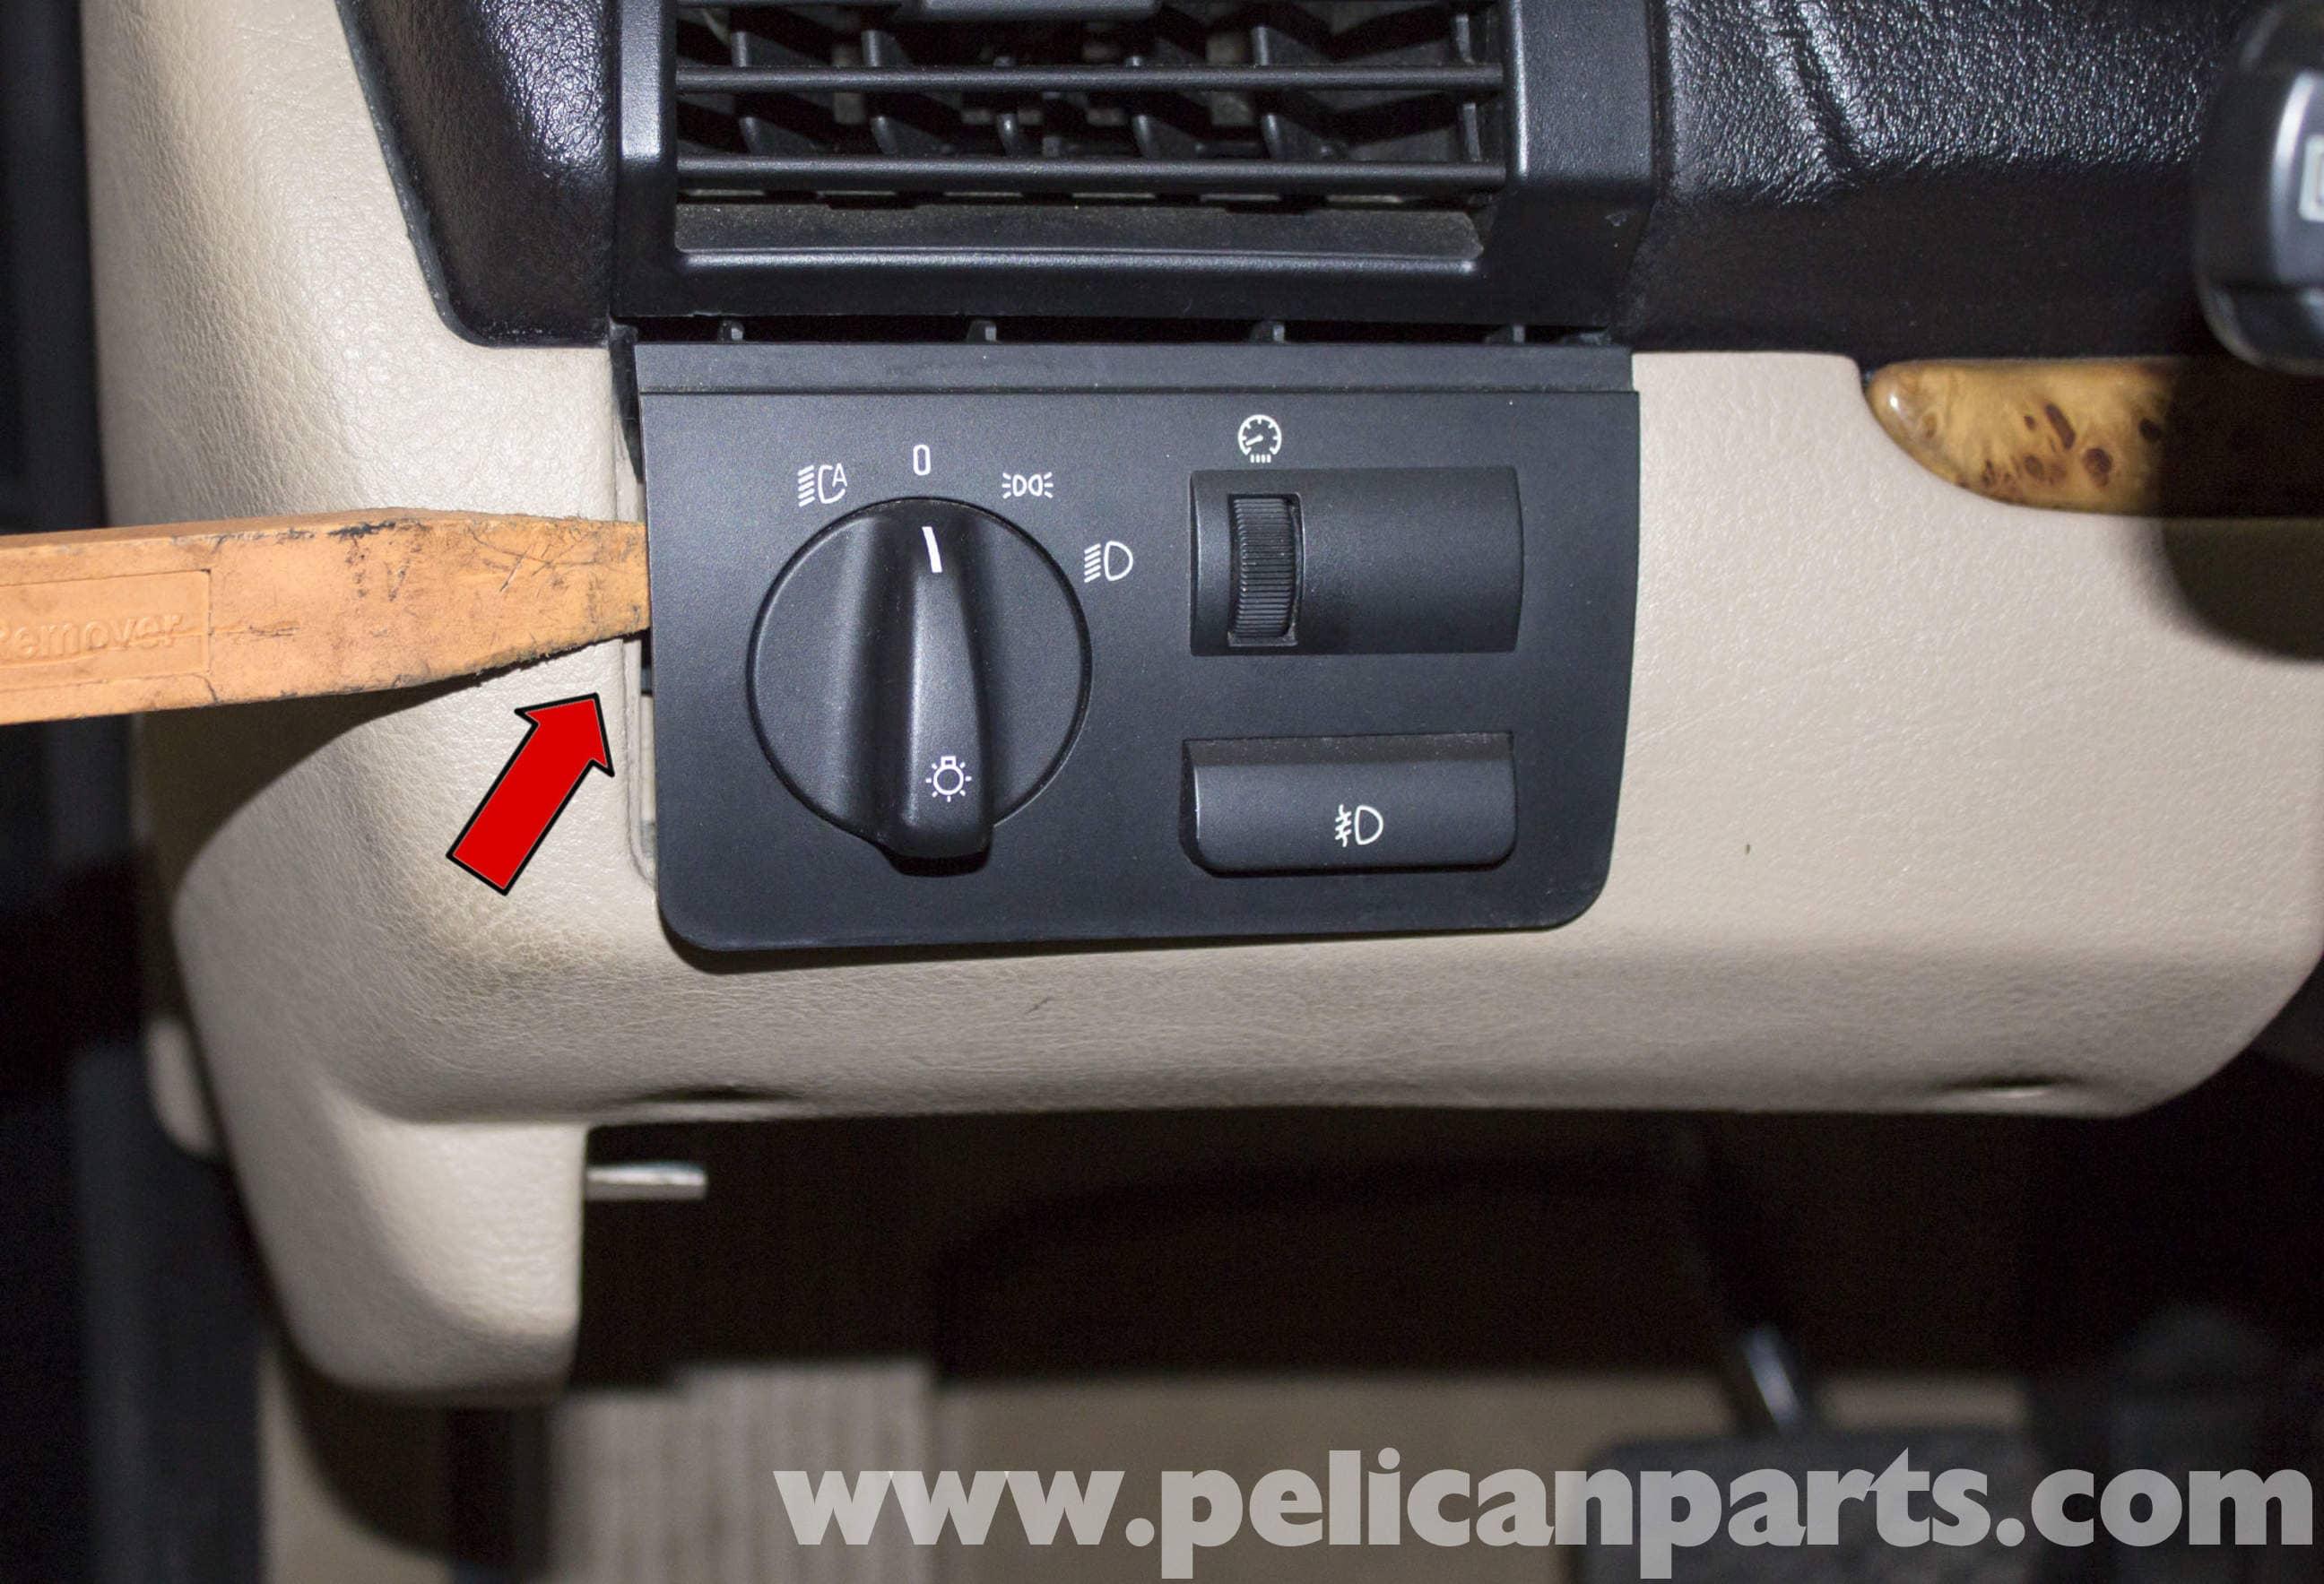 BMW X5 Brake Light Switch Replacement (E53 2000 - 2006